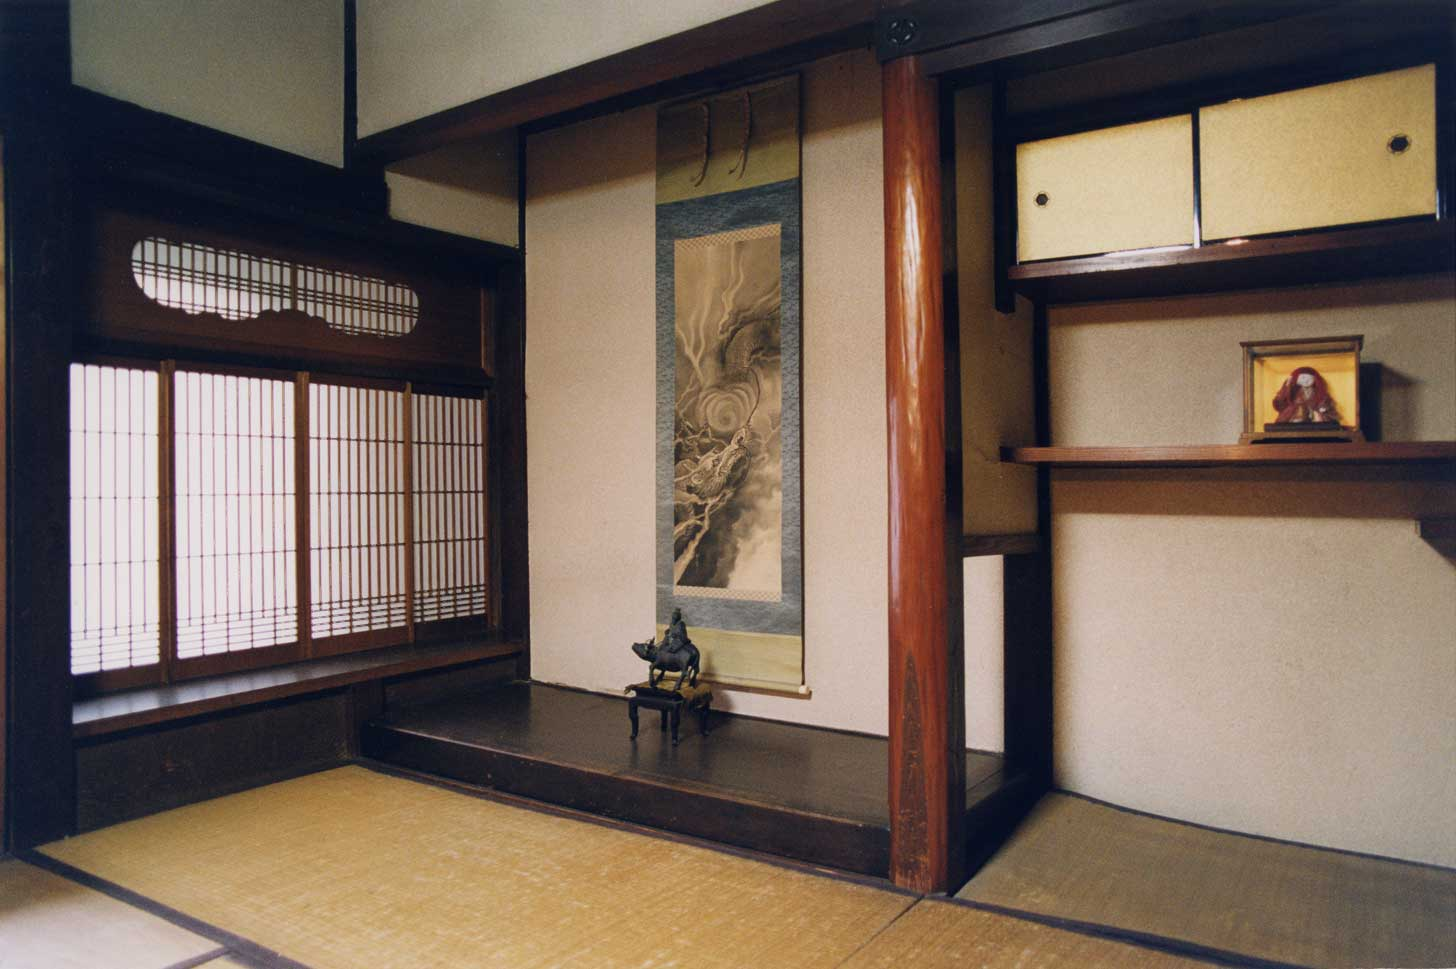 <p>畑田家住宅主屋座敷</p>江戸時代の特徴を残す床の間と入り込み書院